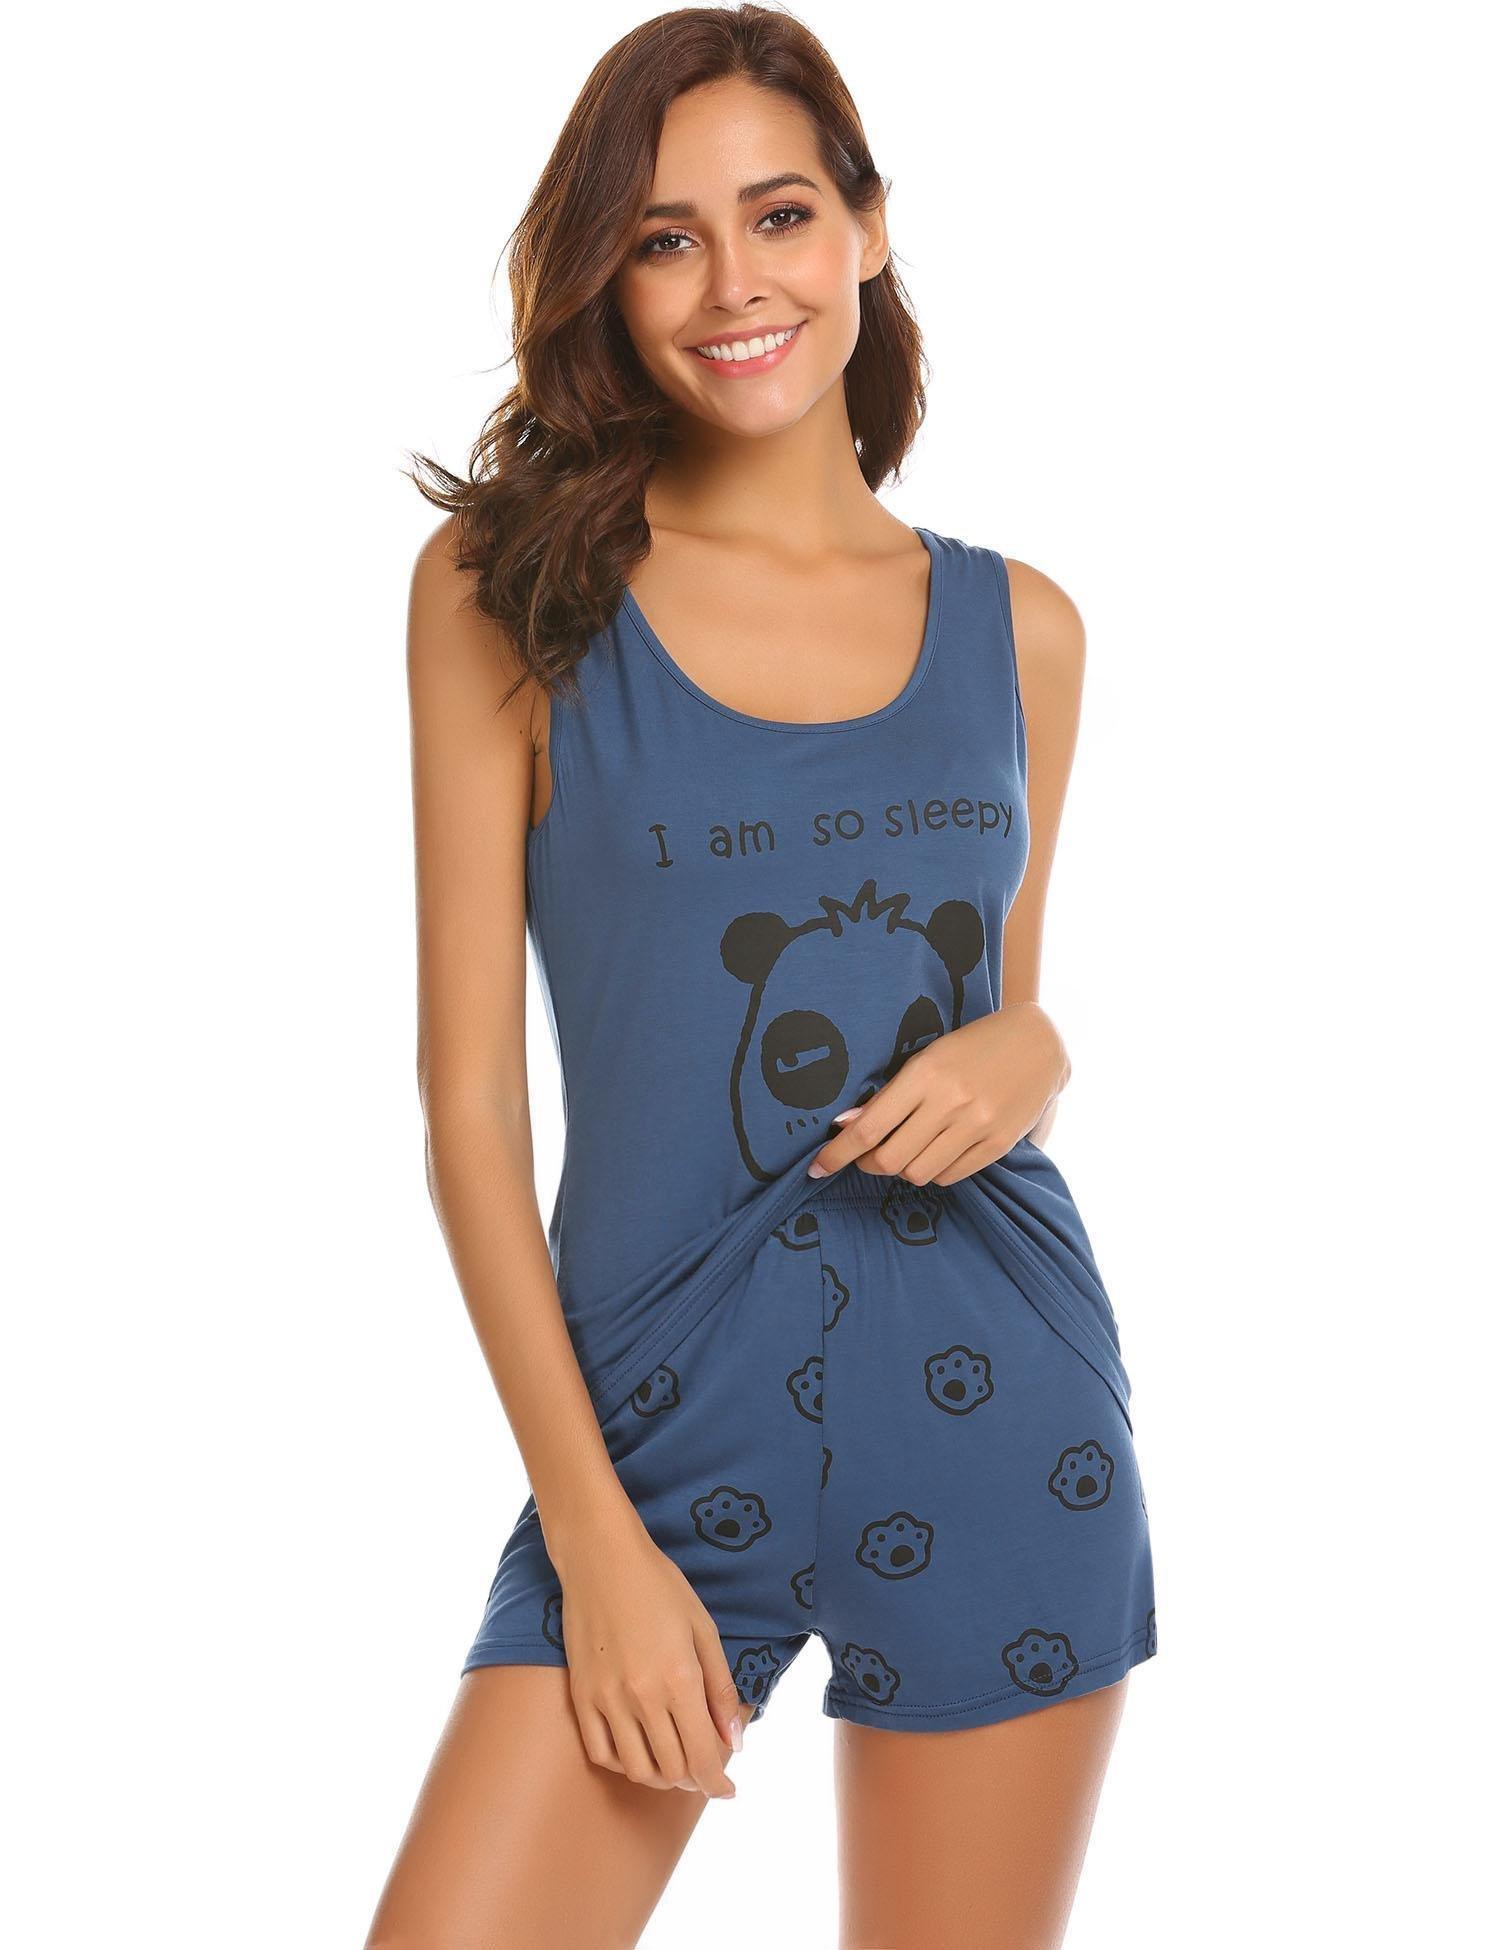 Ekouaer Women's Printed Tank Top and Shorts Sleepwear Pajama Set (Navy Blue M)